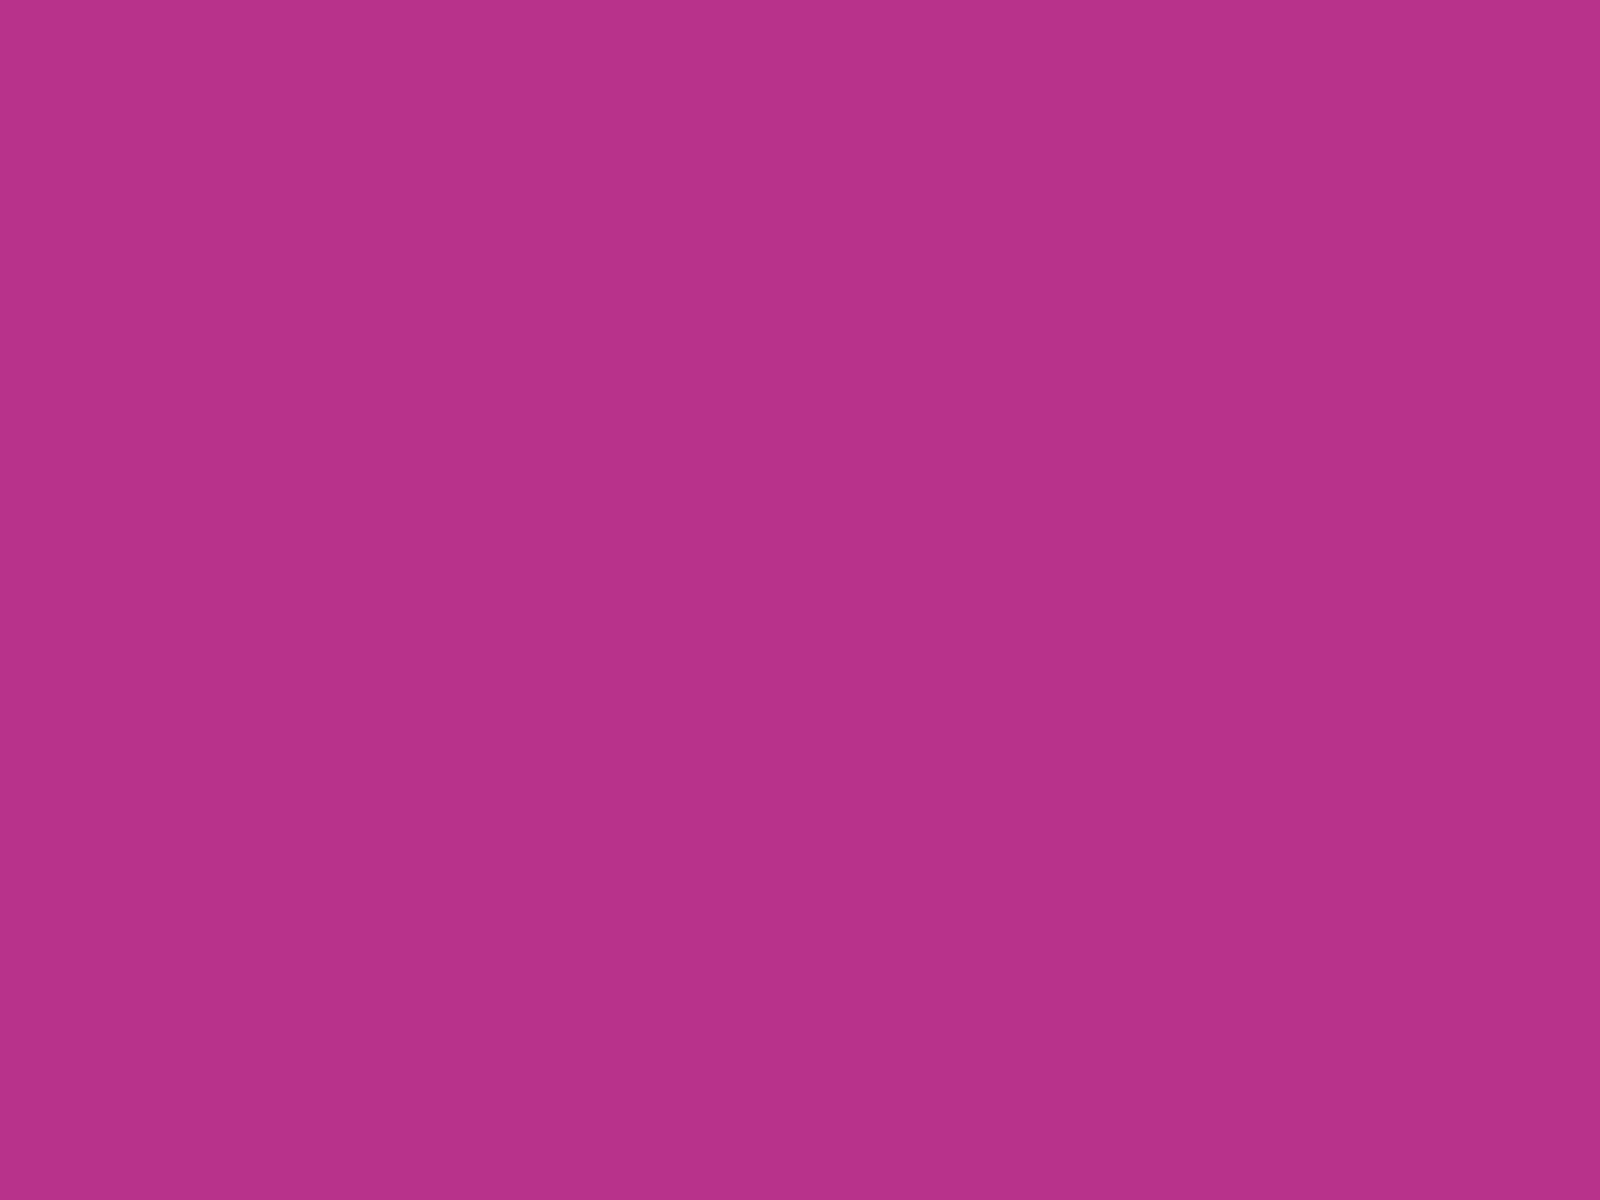 1600x1200 Fandango Solid Color Background